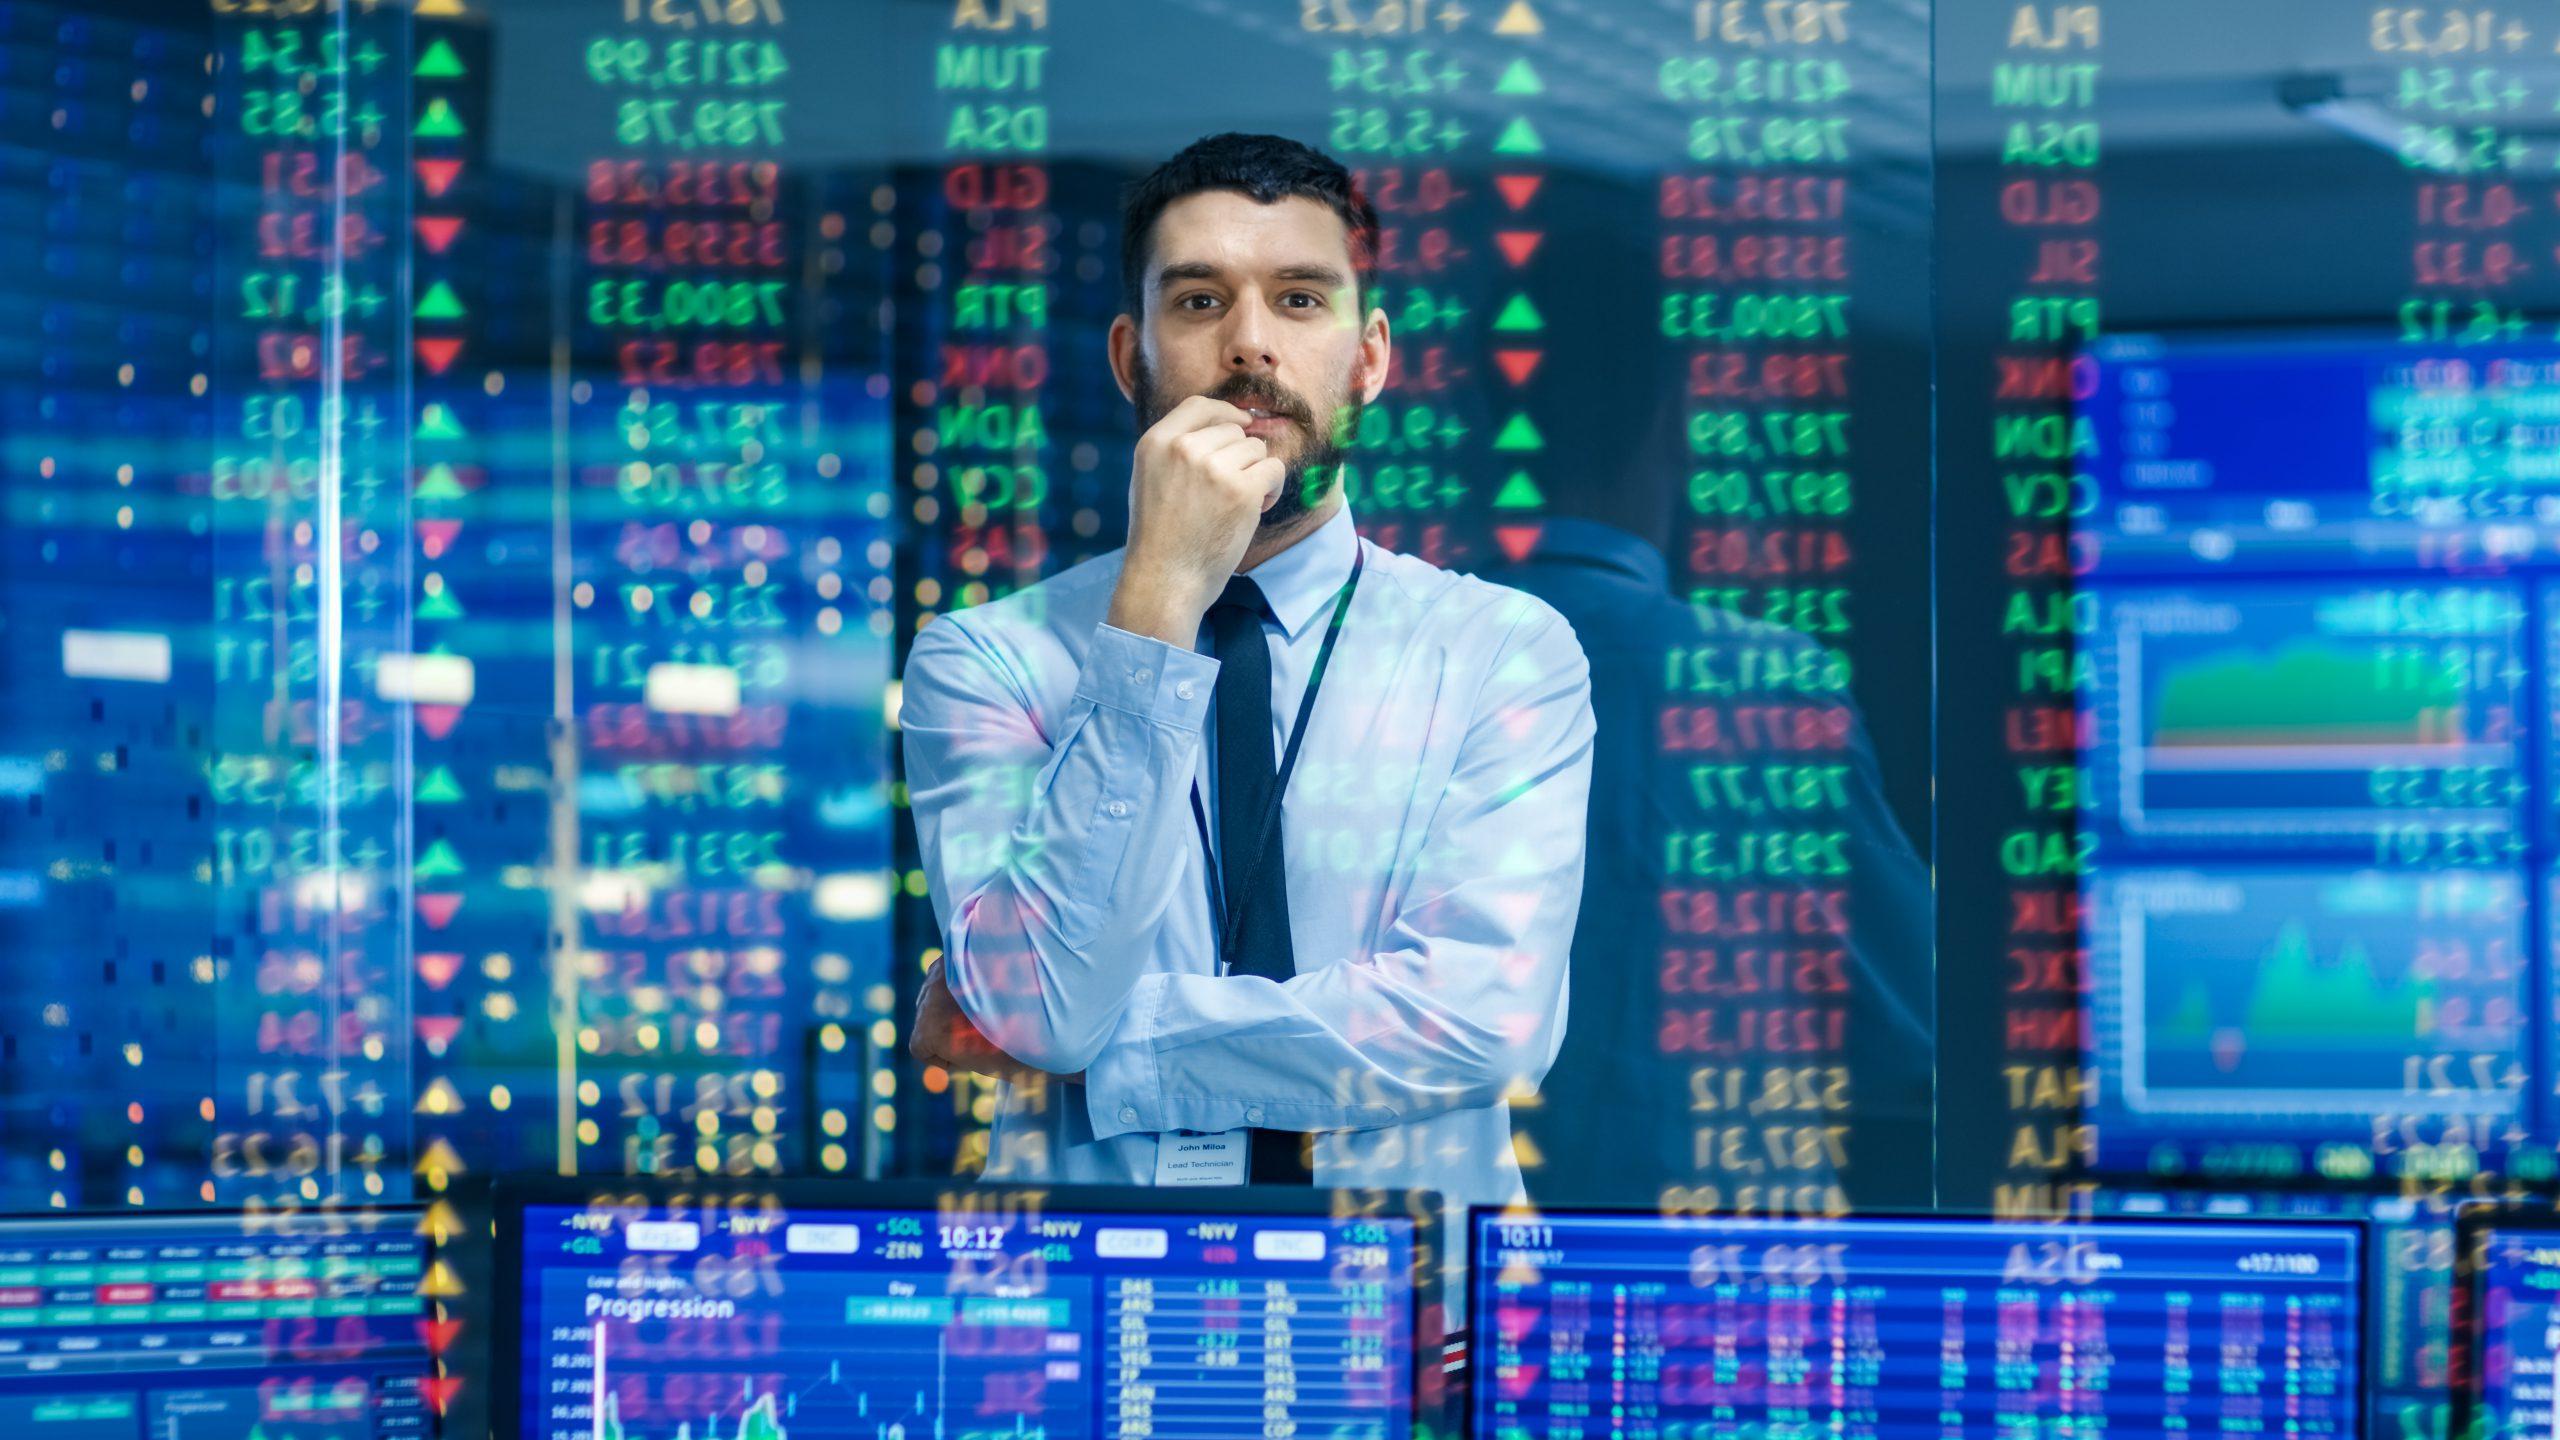 entrepreneur.com - Patrick Ryan - Synchrony Financial vs. Visa: Which Consumer Finance Stock is a Better Buy?